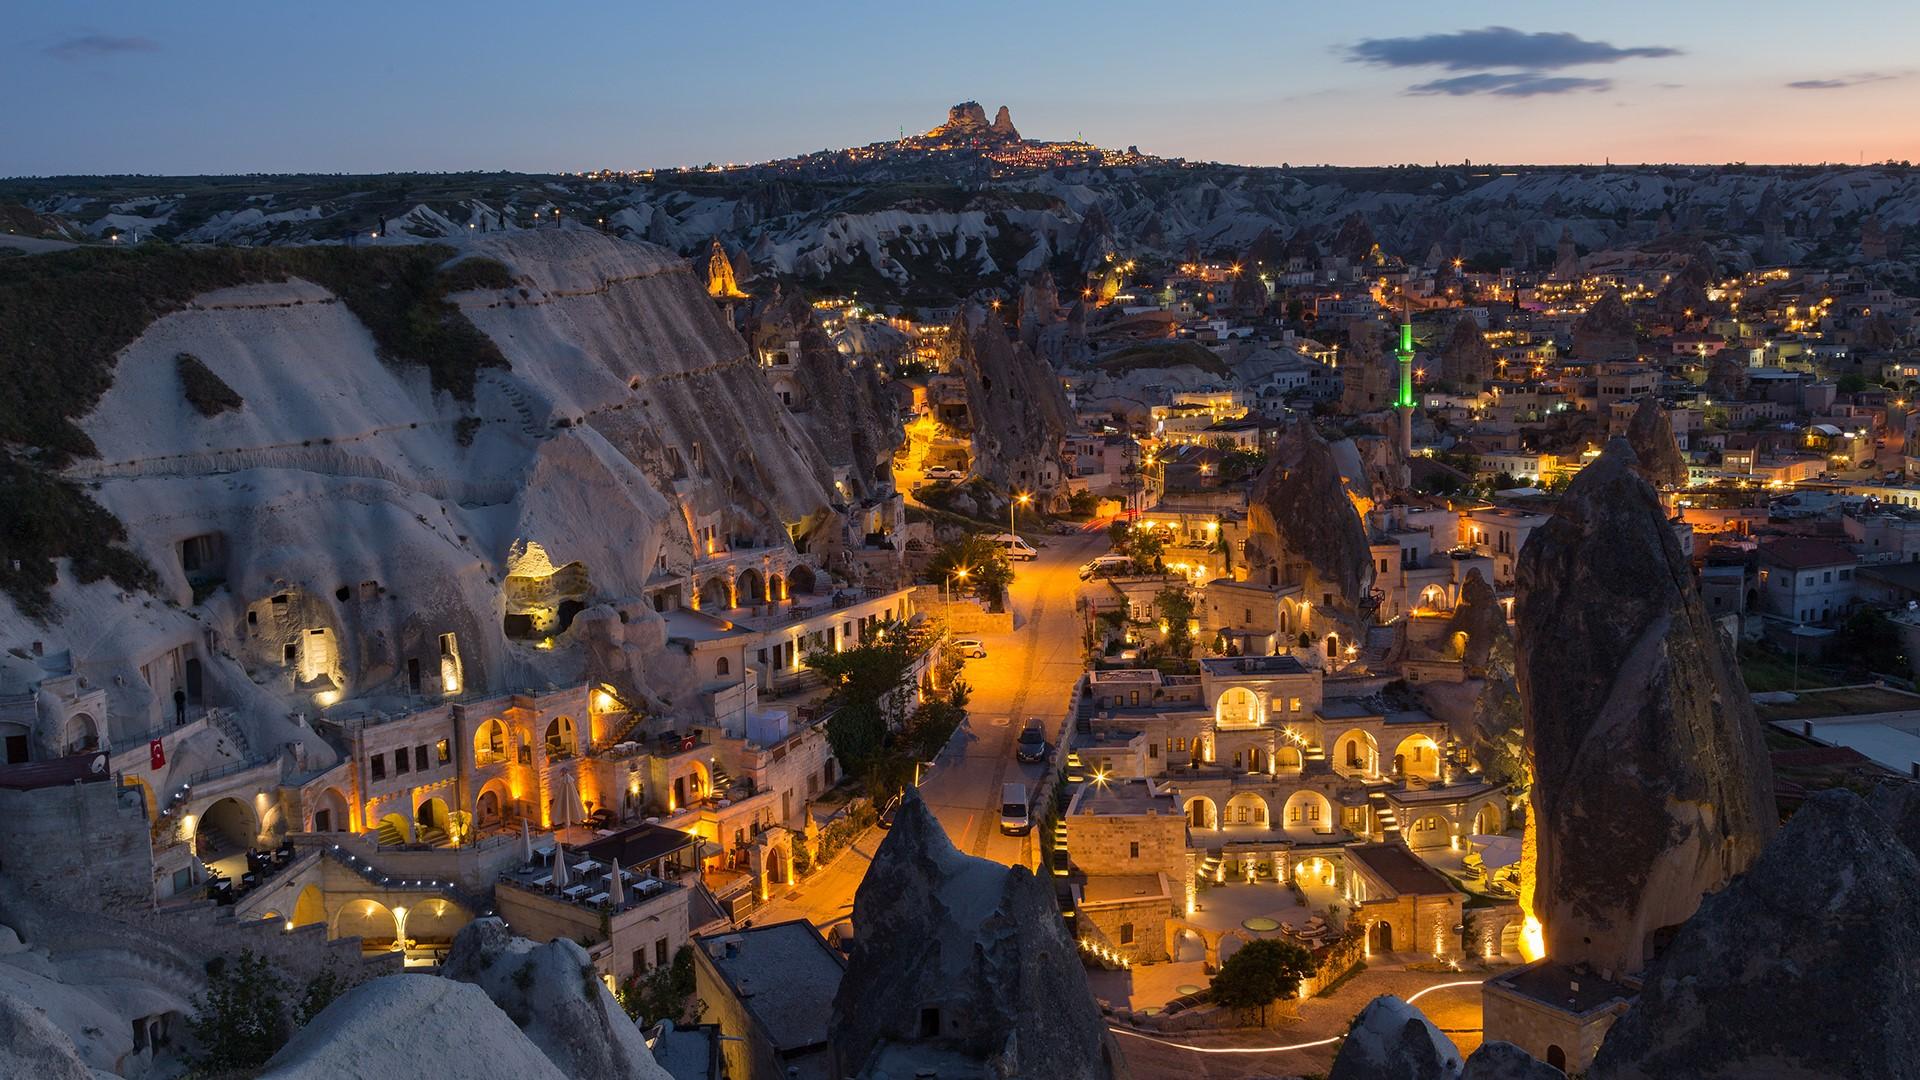 The Twilight Time At Goreme Cappadocia Turkey Windows 10 Spotlight Images